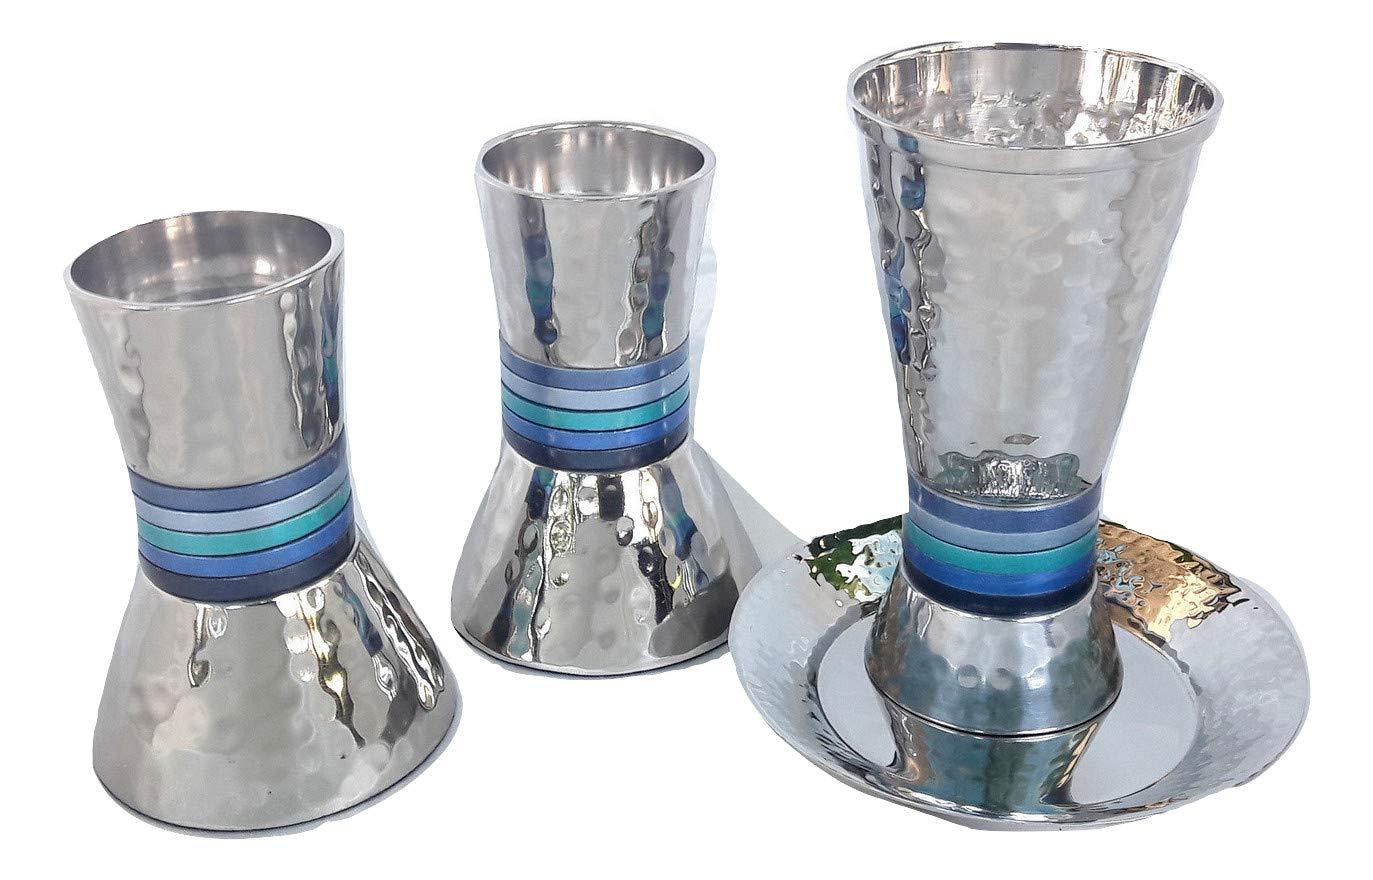 gift set for Shabbat Aluminum textured blue/silver Candlesticks & kiddush cup